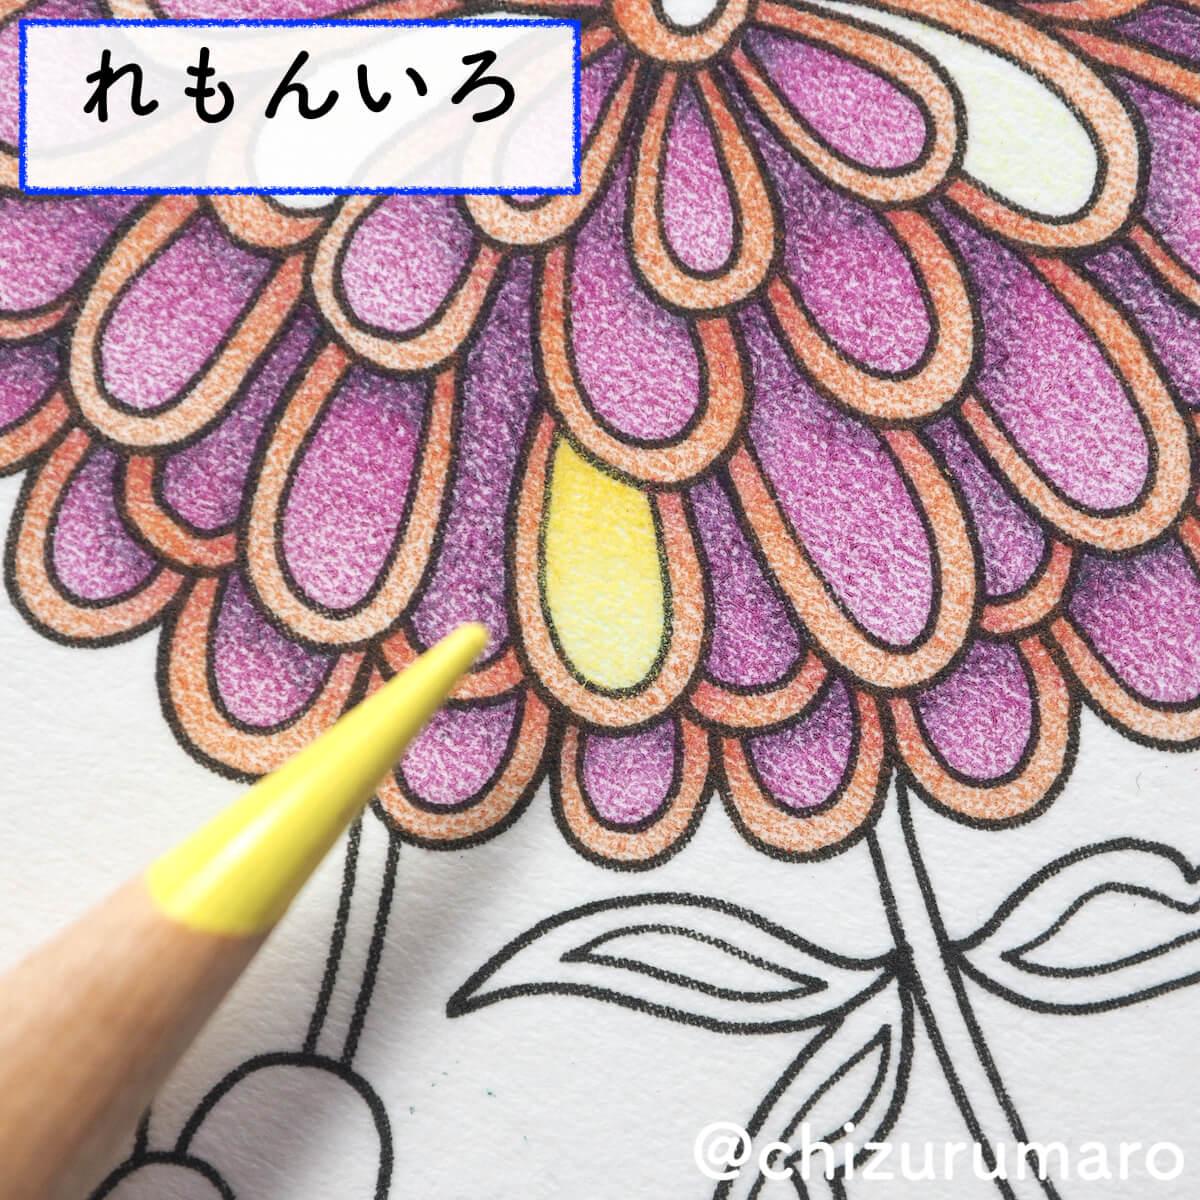 f:id:chizurumaro:20200422153149j:plain